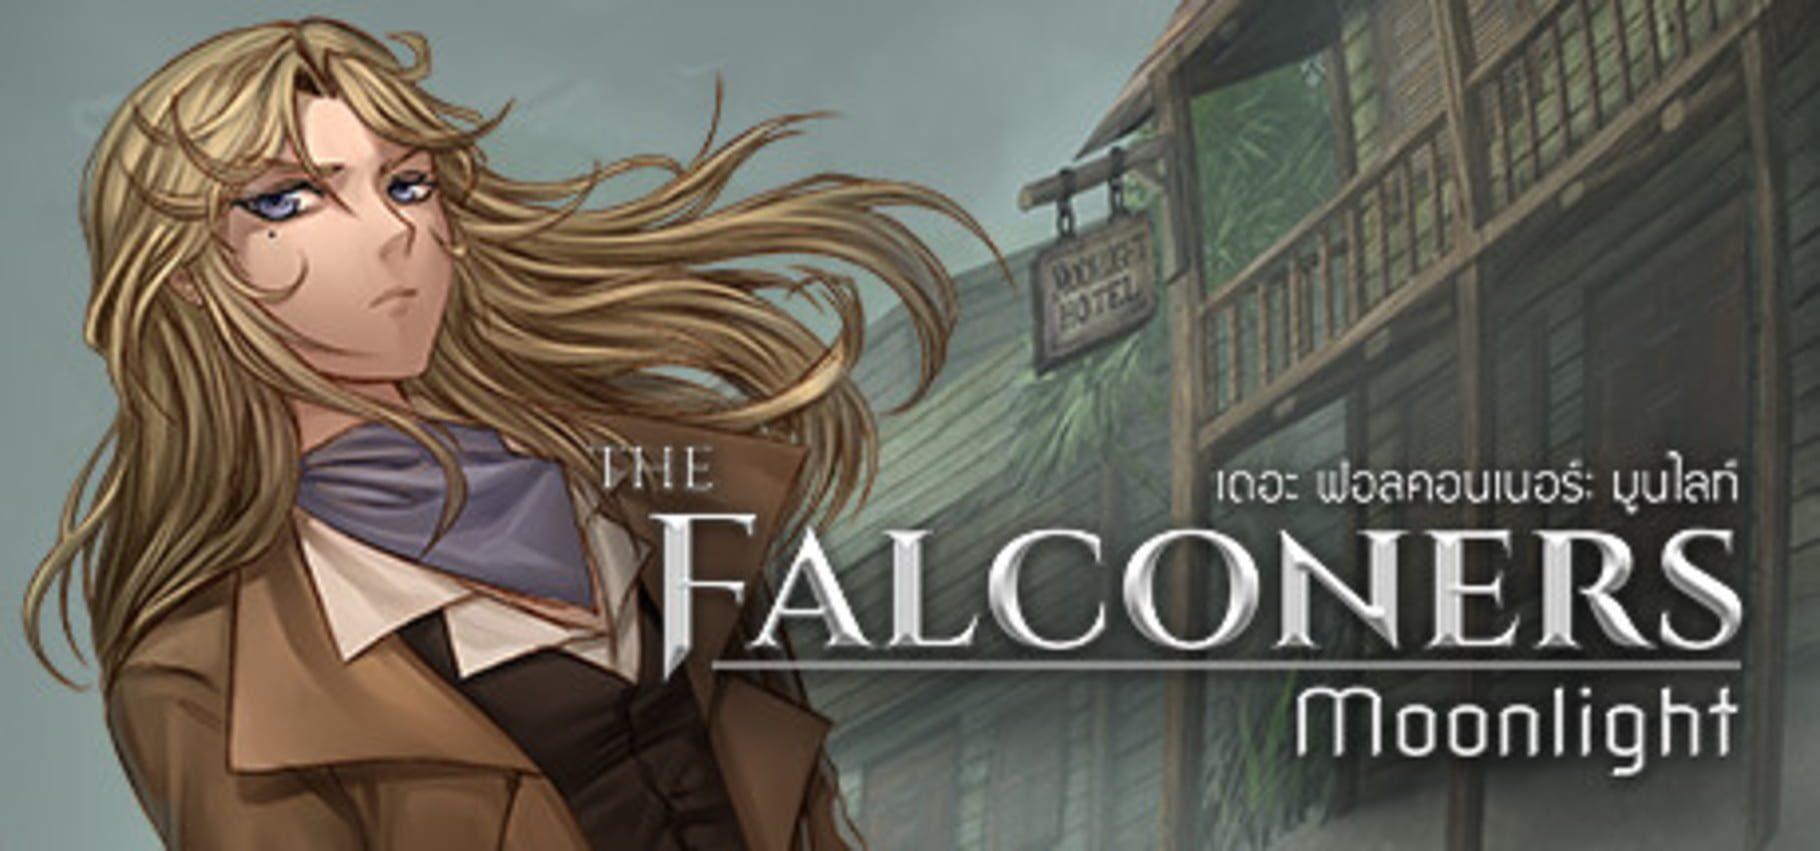 buy The Falconers: Moonlight cd key for all platform